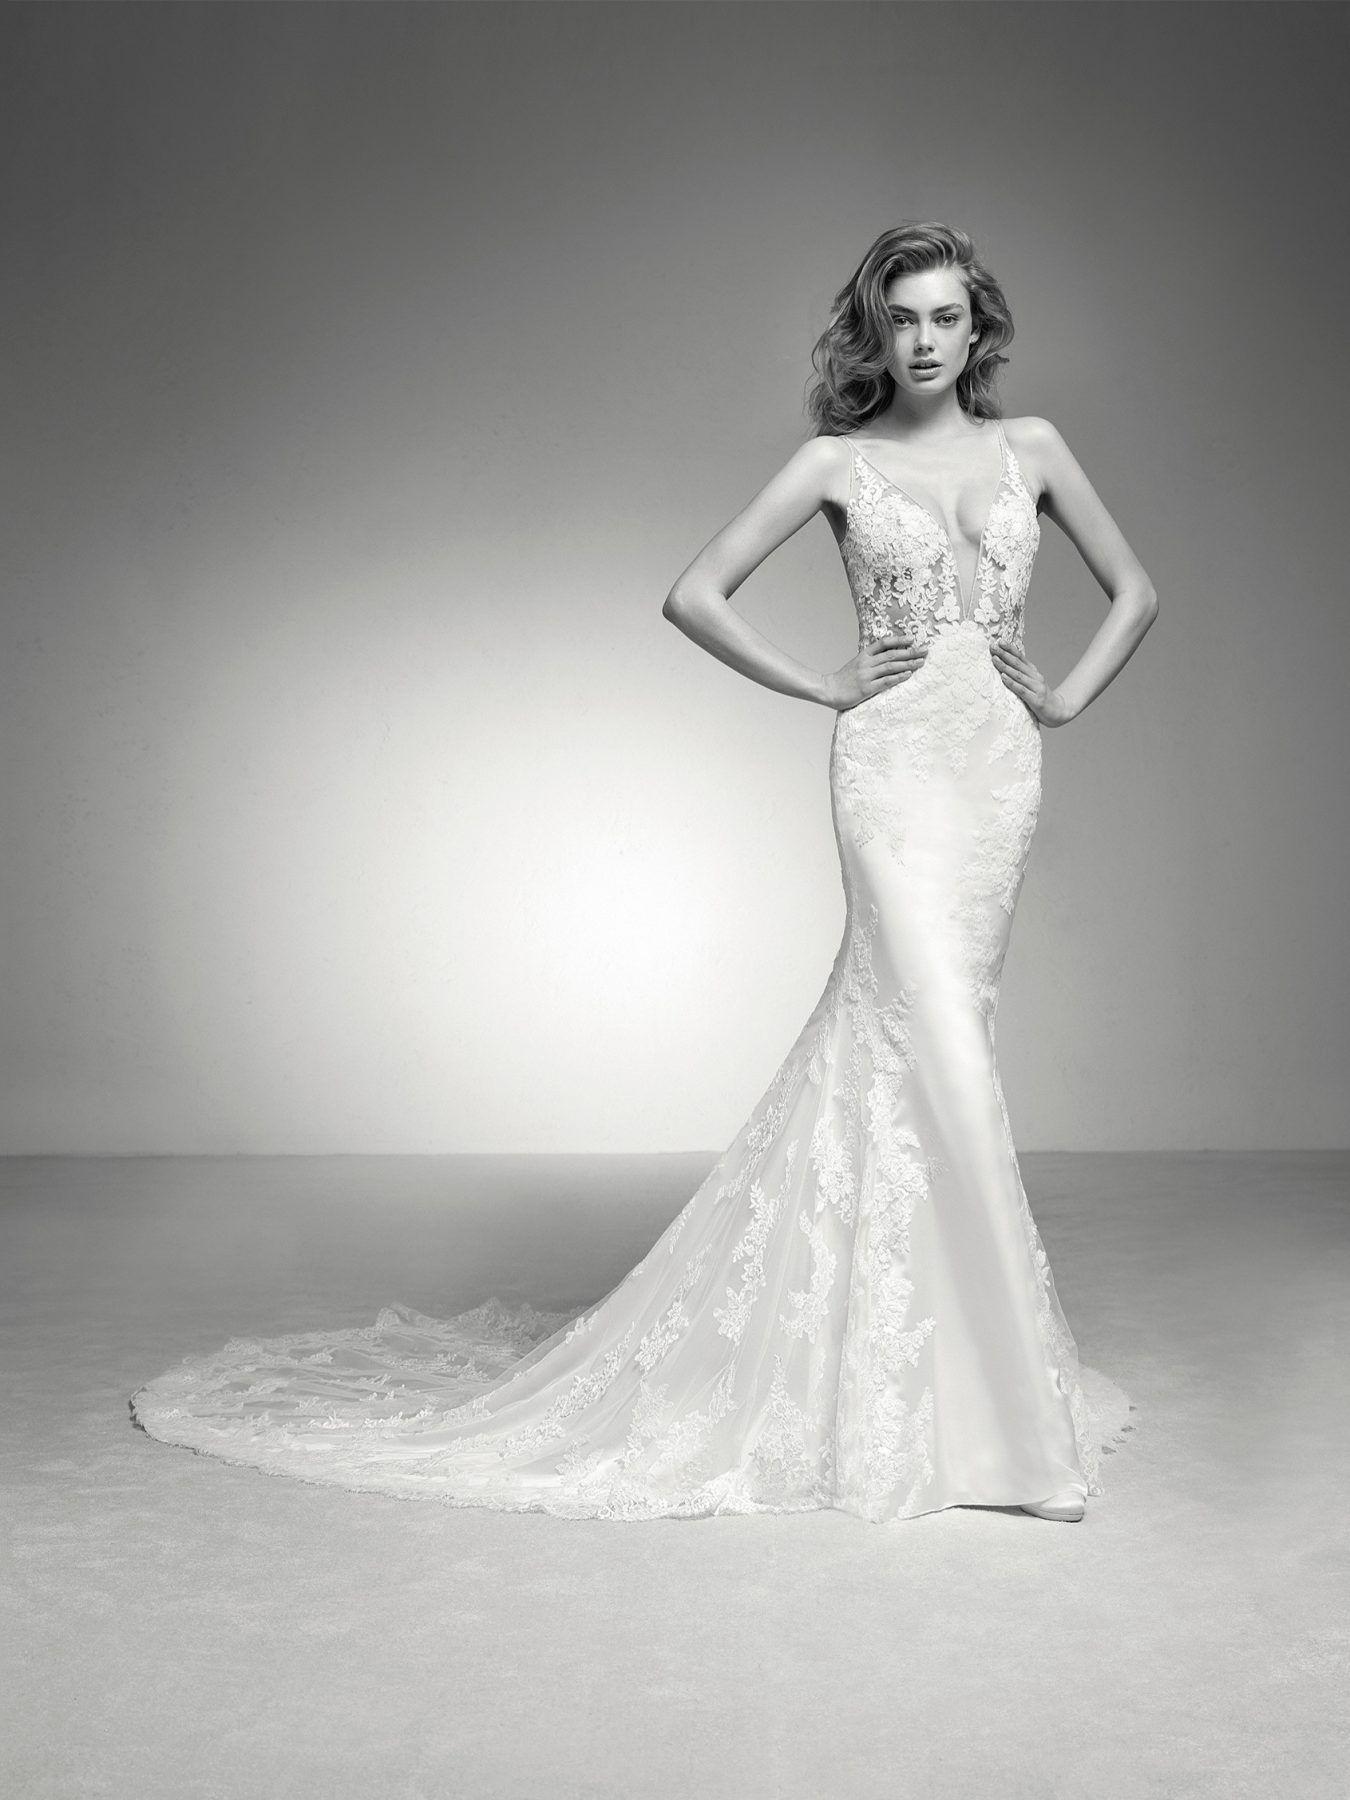 Tulle skirt wedding dress  Fit and flare Vneck illusion lace and tulle skirt wedding dress